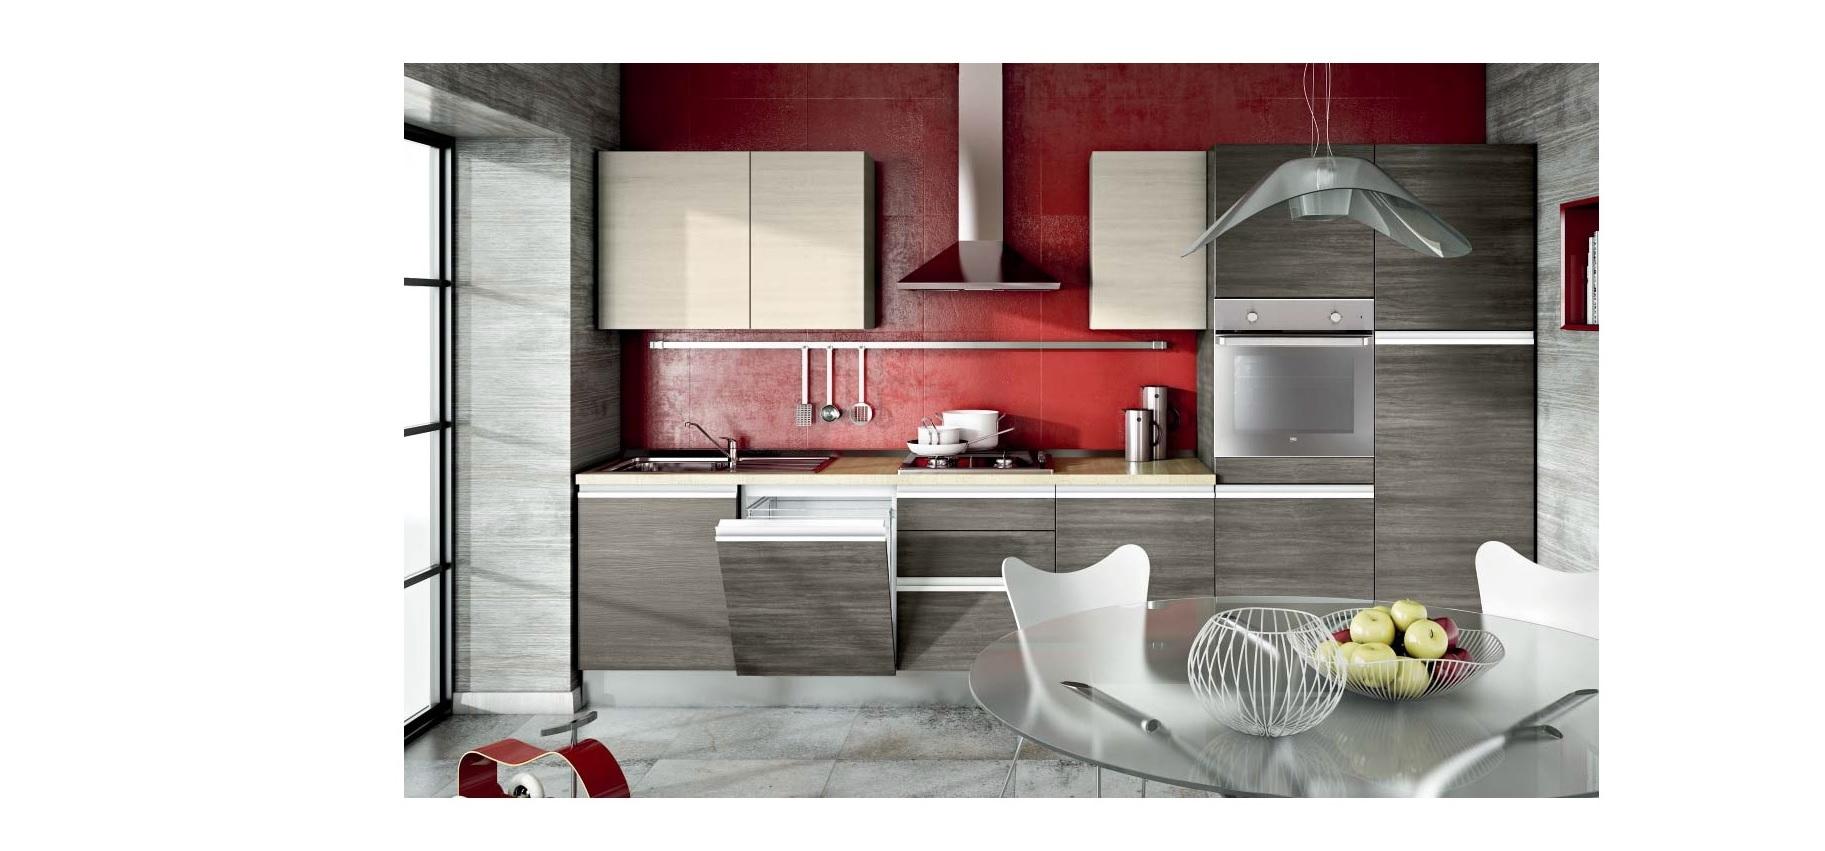 Cucina lineare moderna linea in offerta completa con for Forno a legna cucina moderna